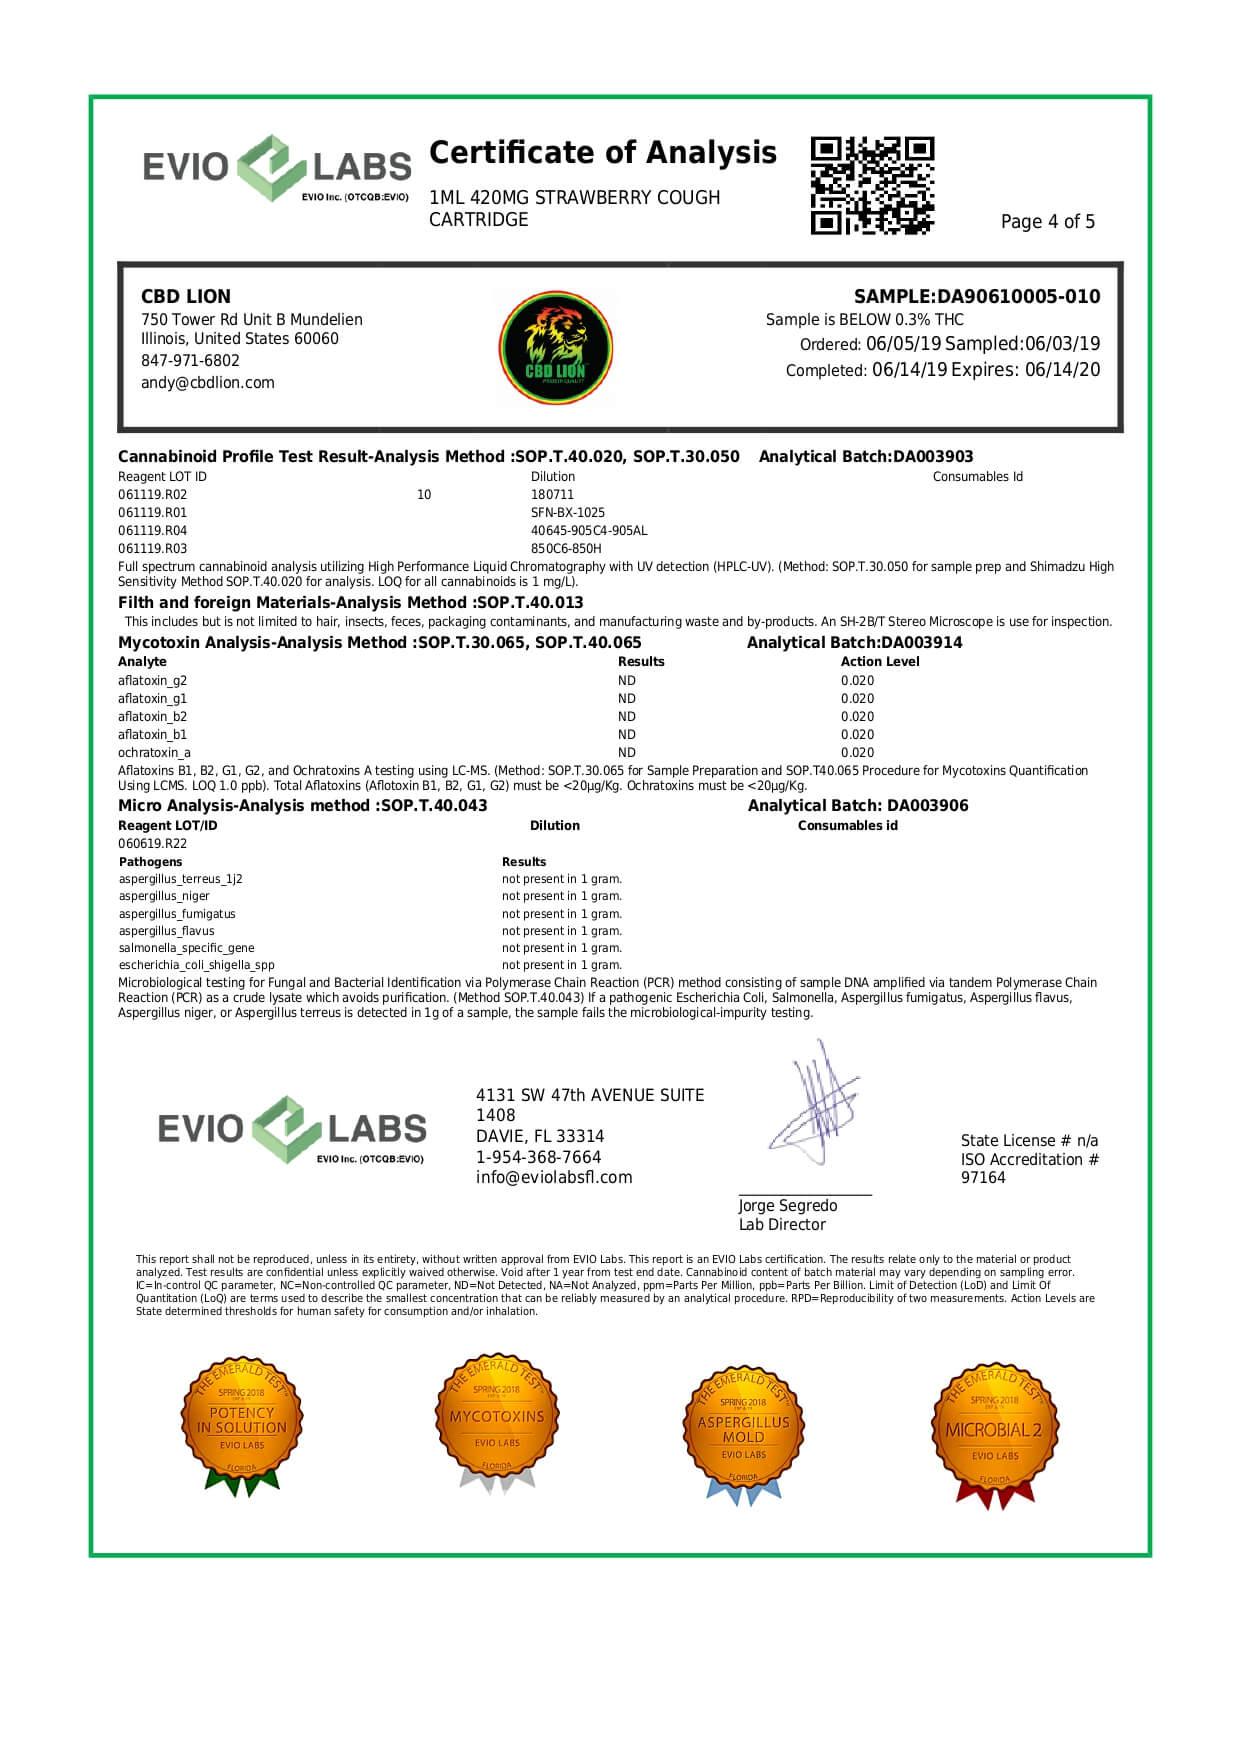 CBD Lion CBD Cartridge Strawberry Cough 420mg Lab Report